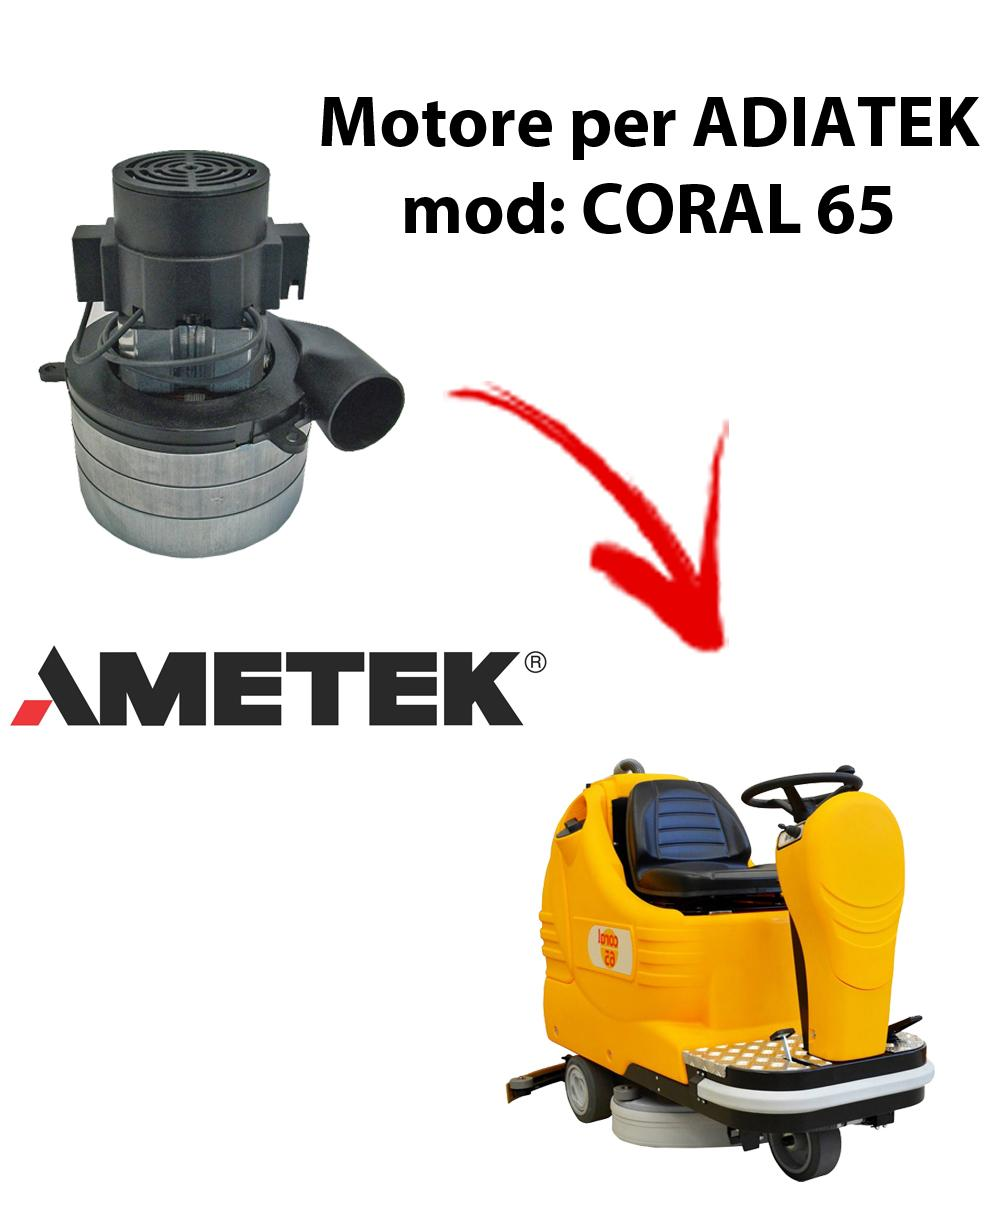 Coral 65 Motore aspirazione AMETEK ITALIA per lavapavimenti Adiatek